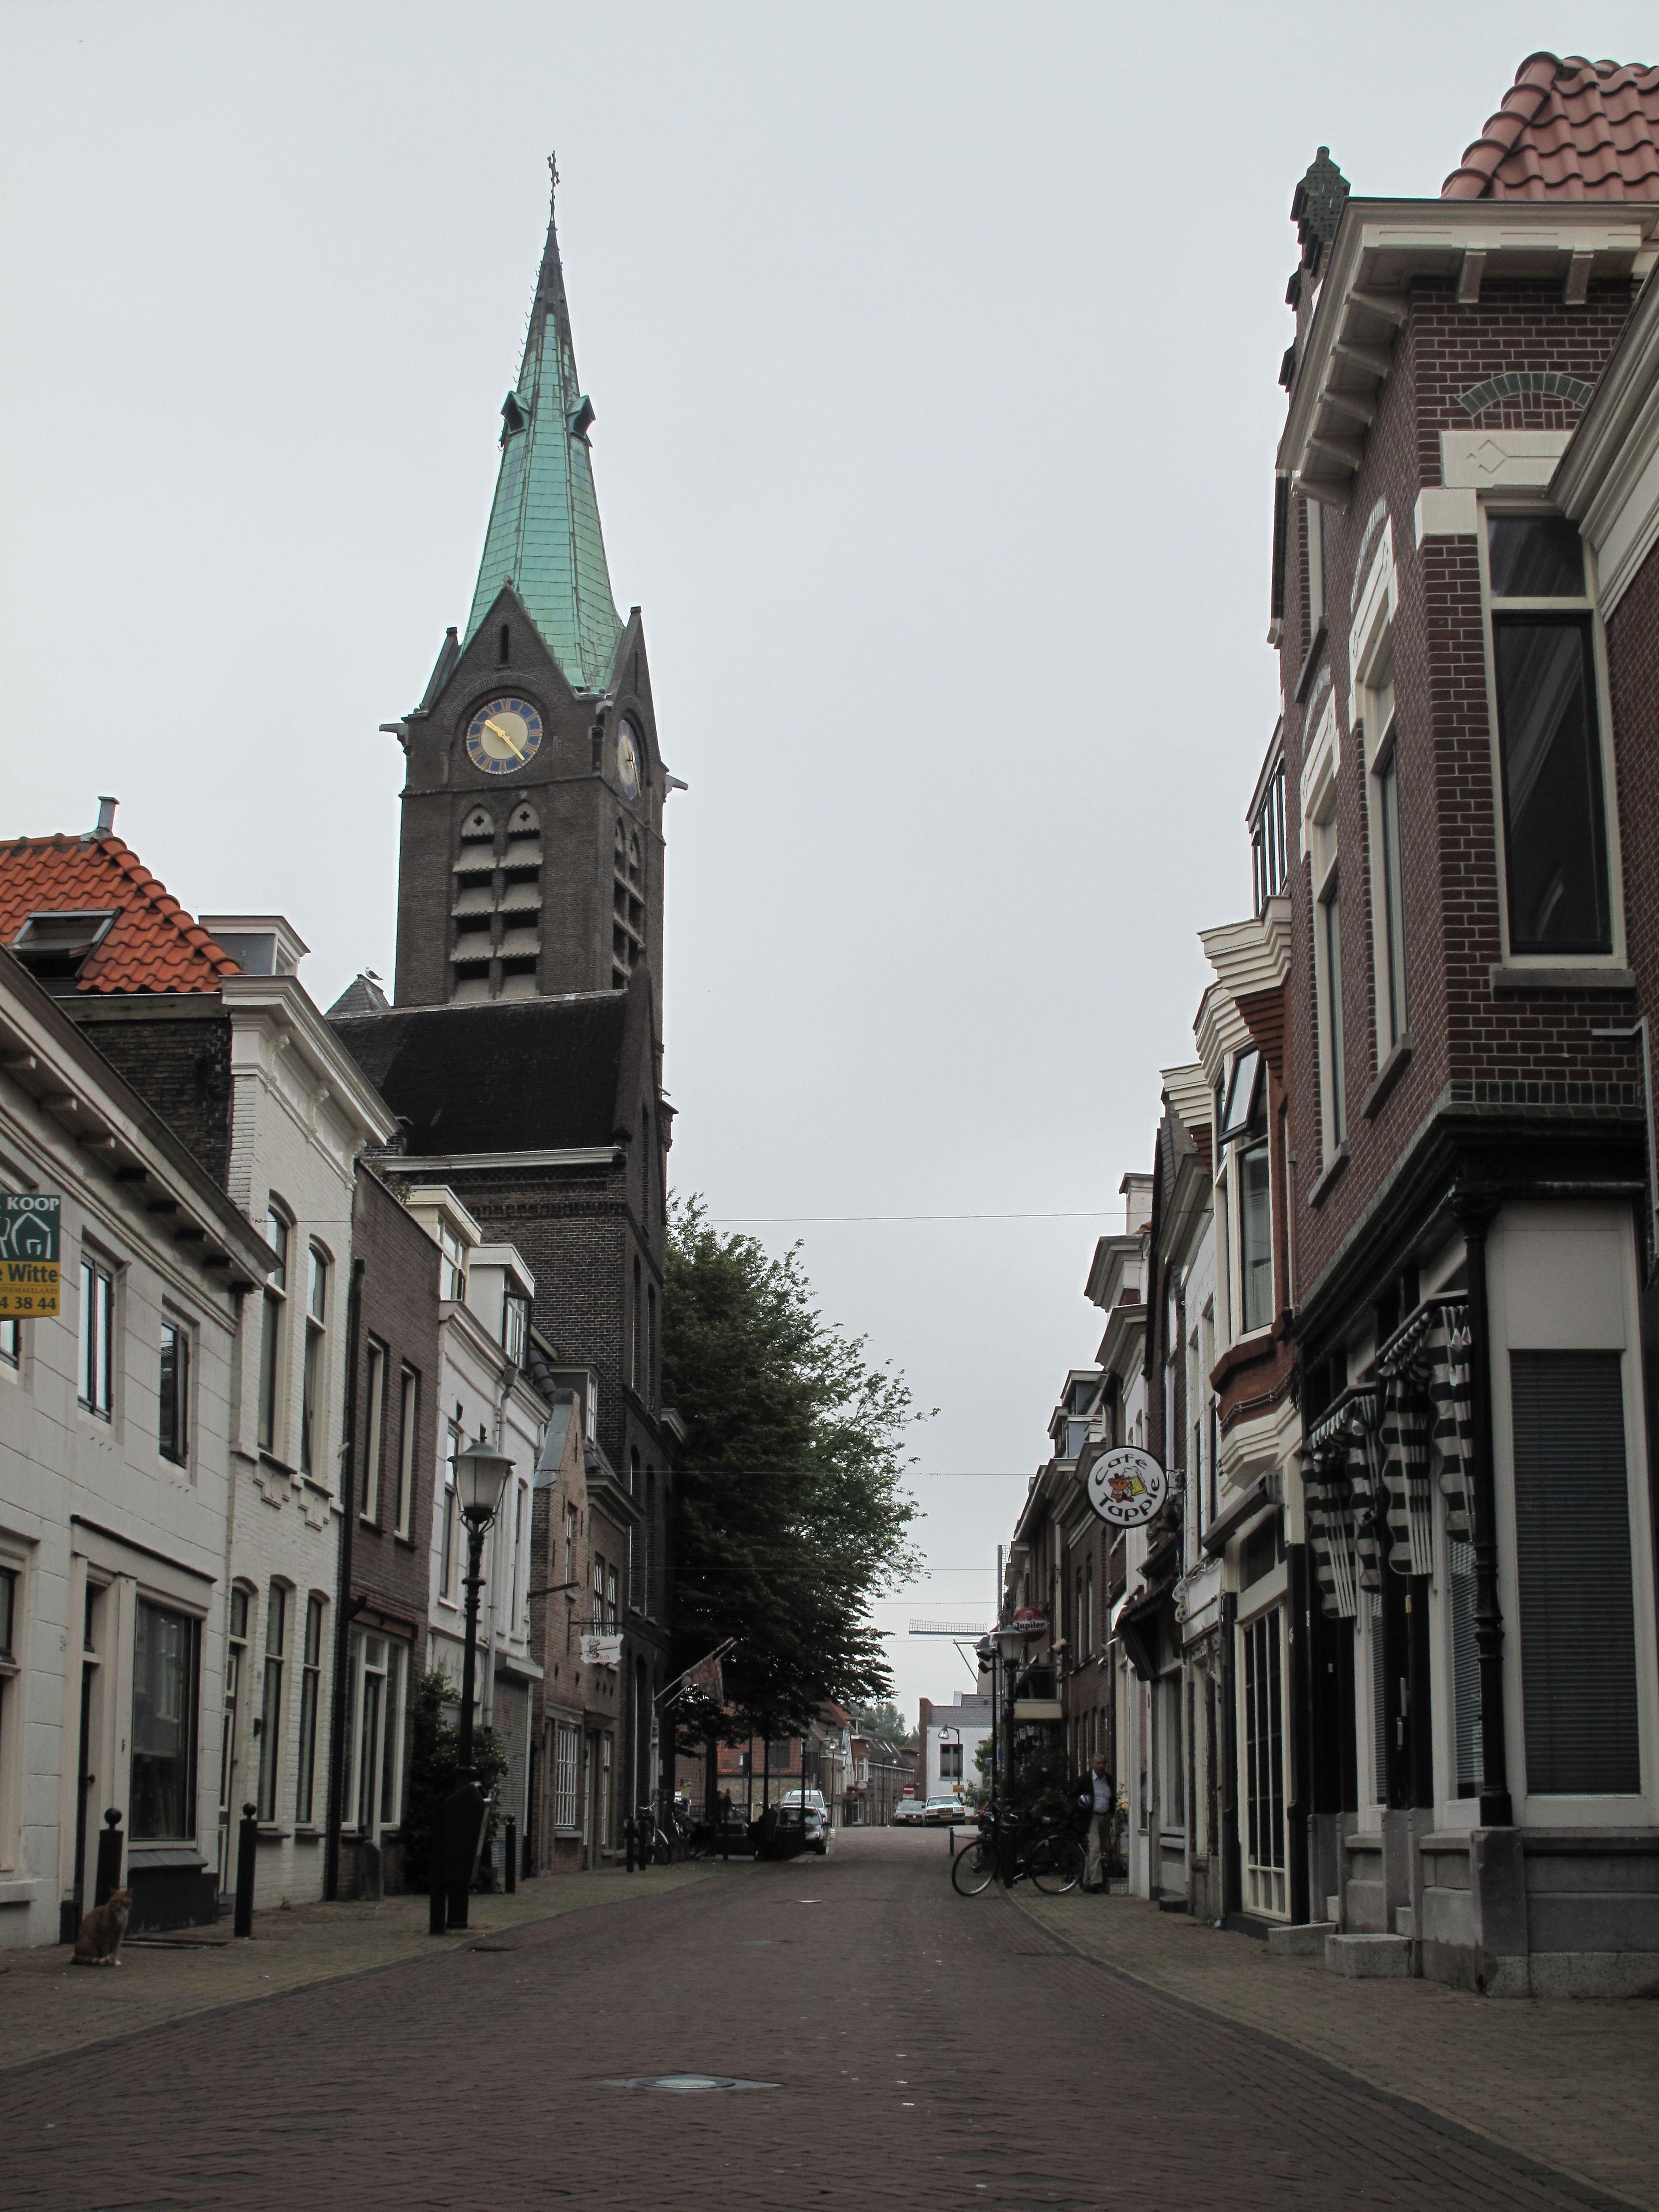 Vlaardingen 0 I grew up not far from here Holland, Stad